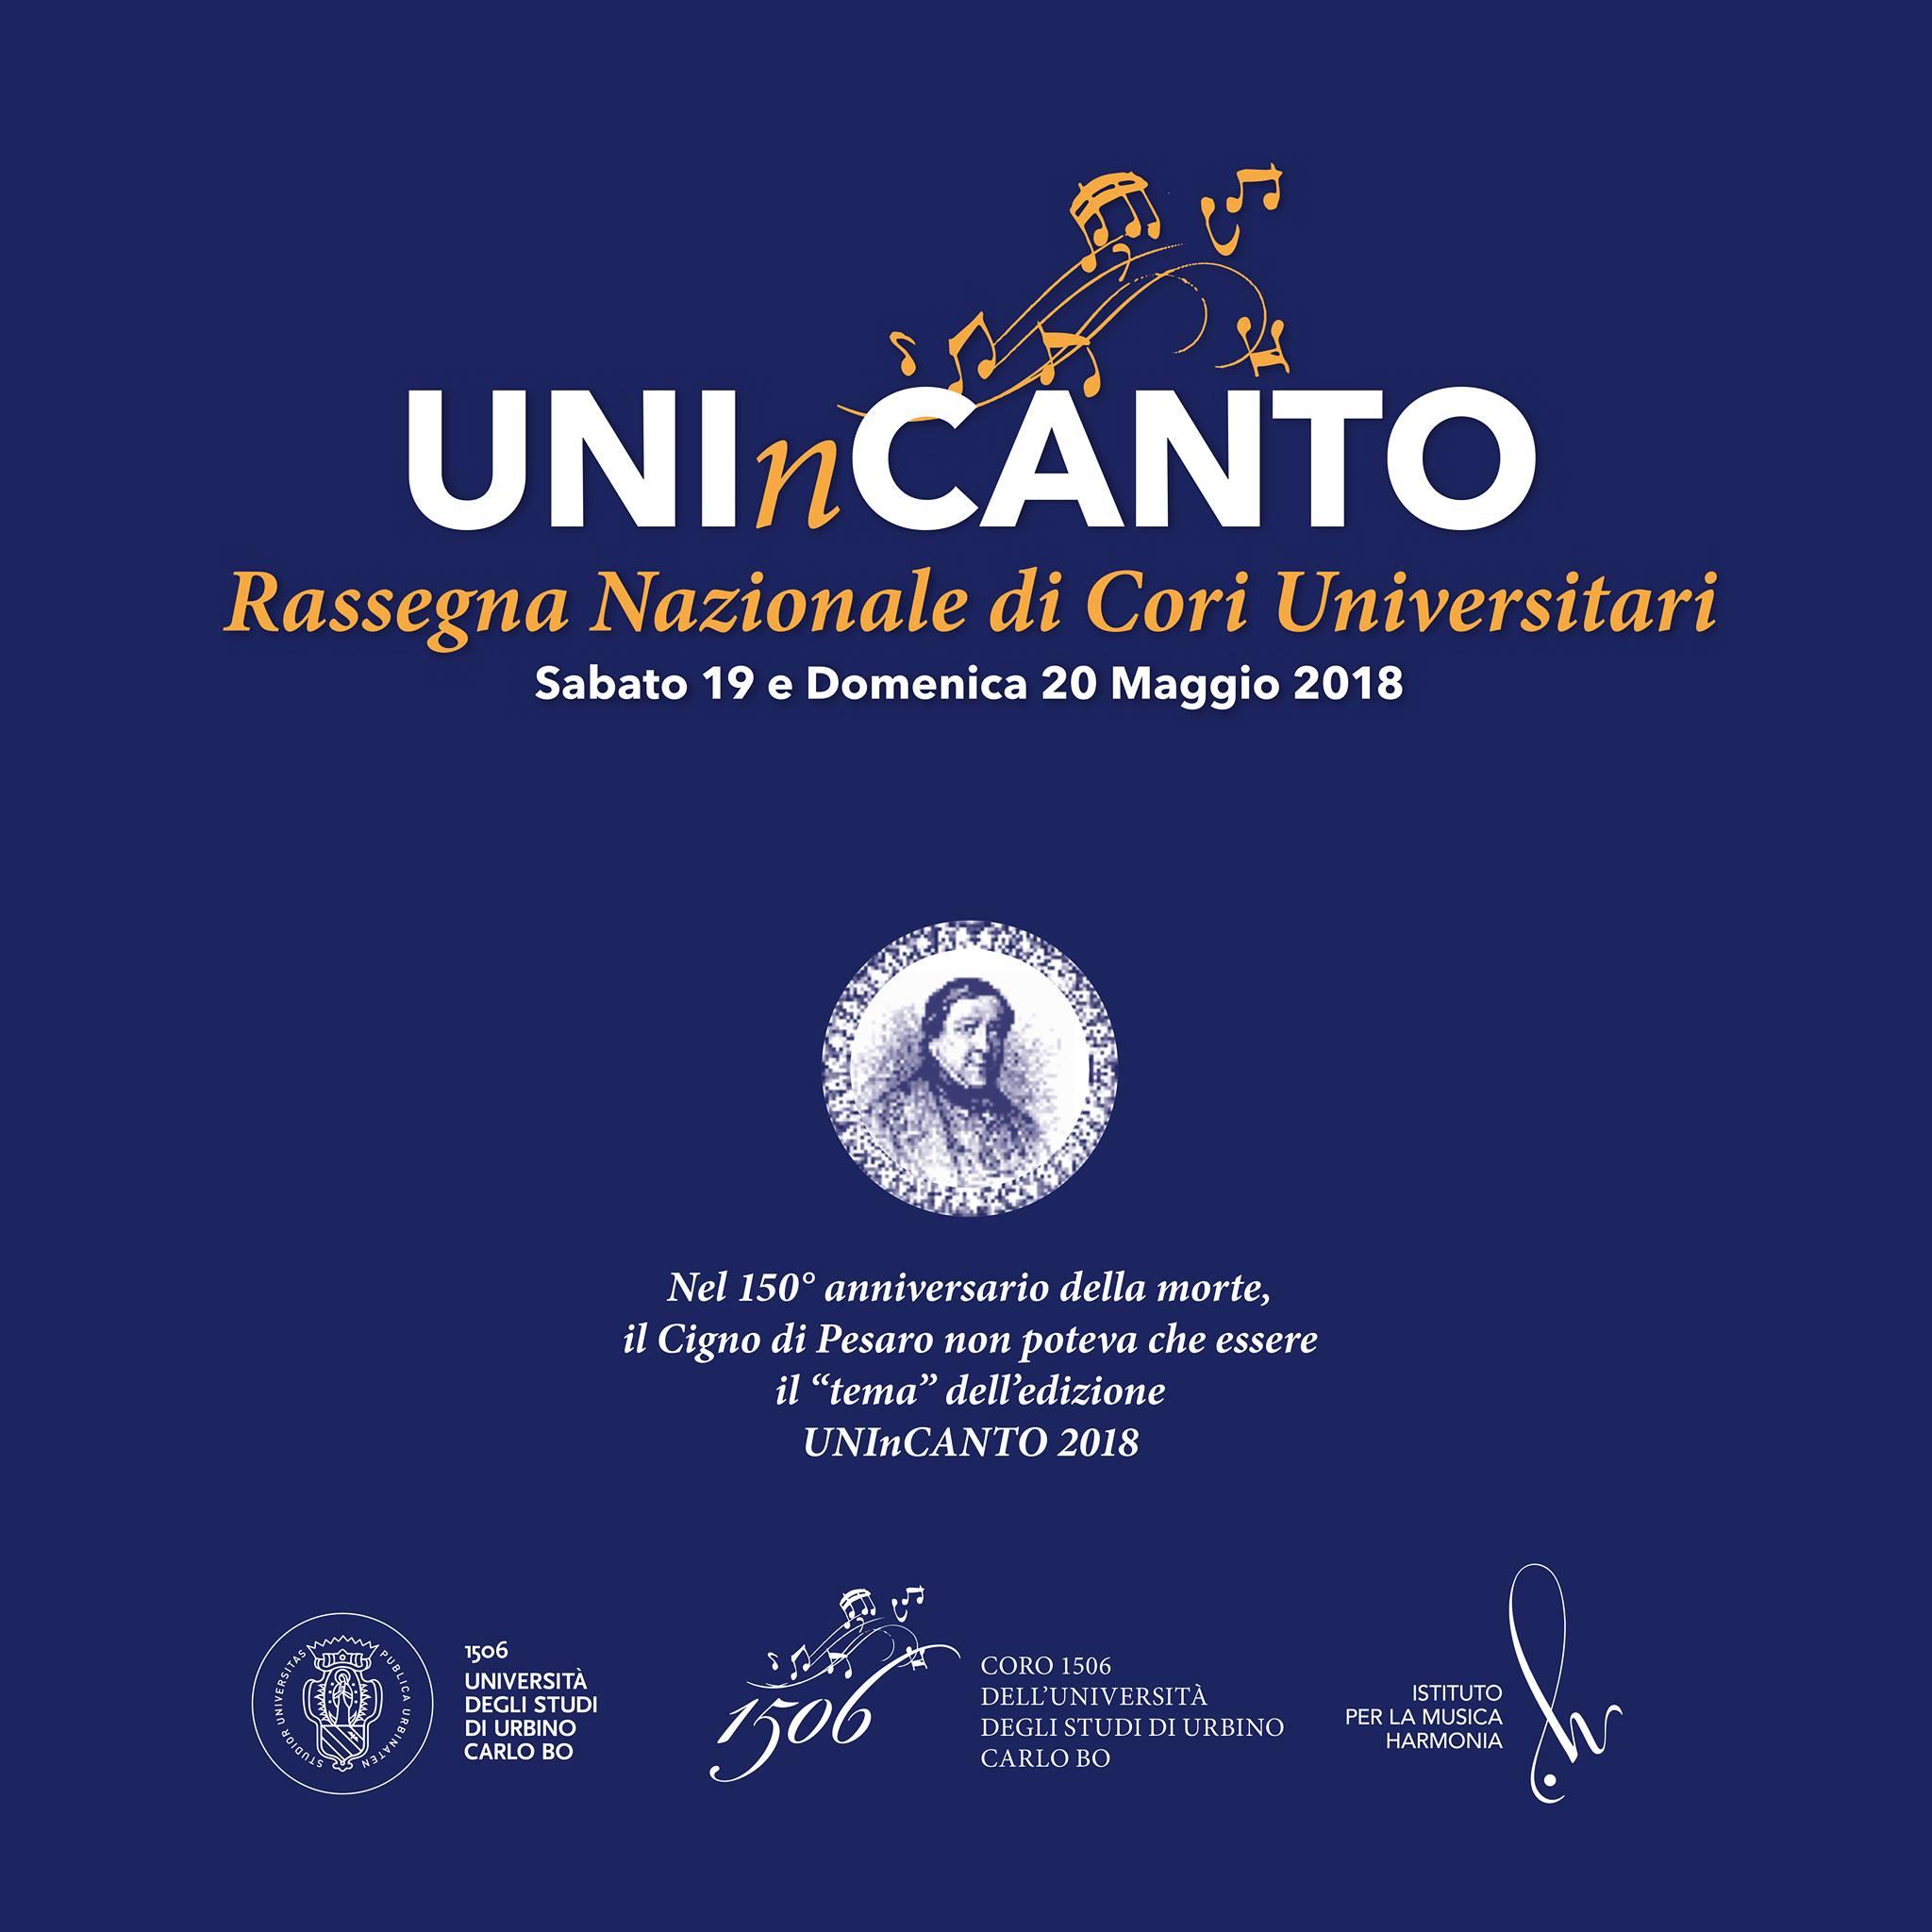 UNInCANTO 2018 - Rassegna dei cori universitari @ Urbino